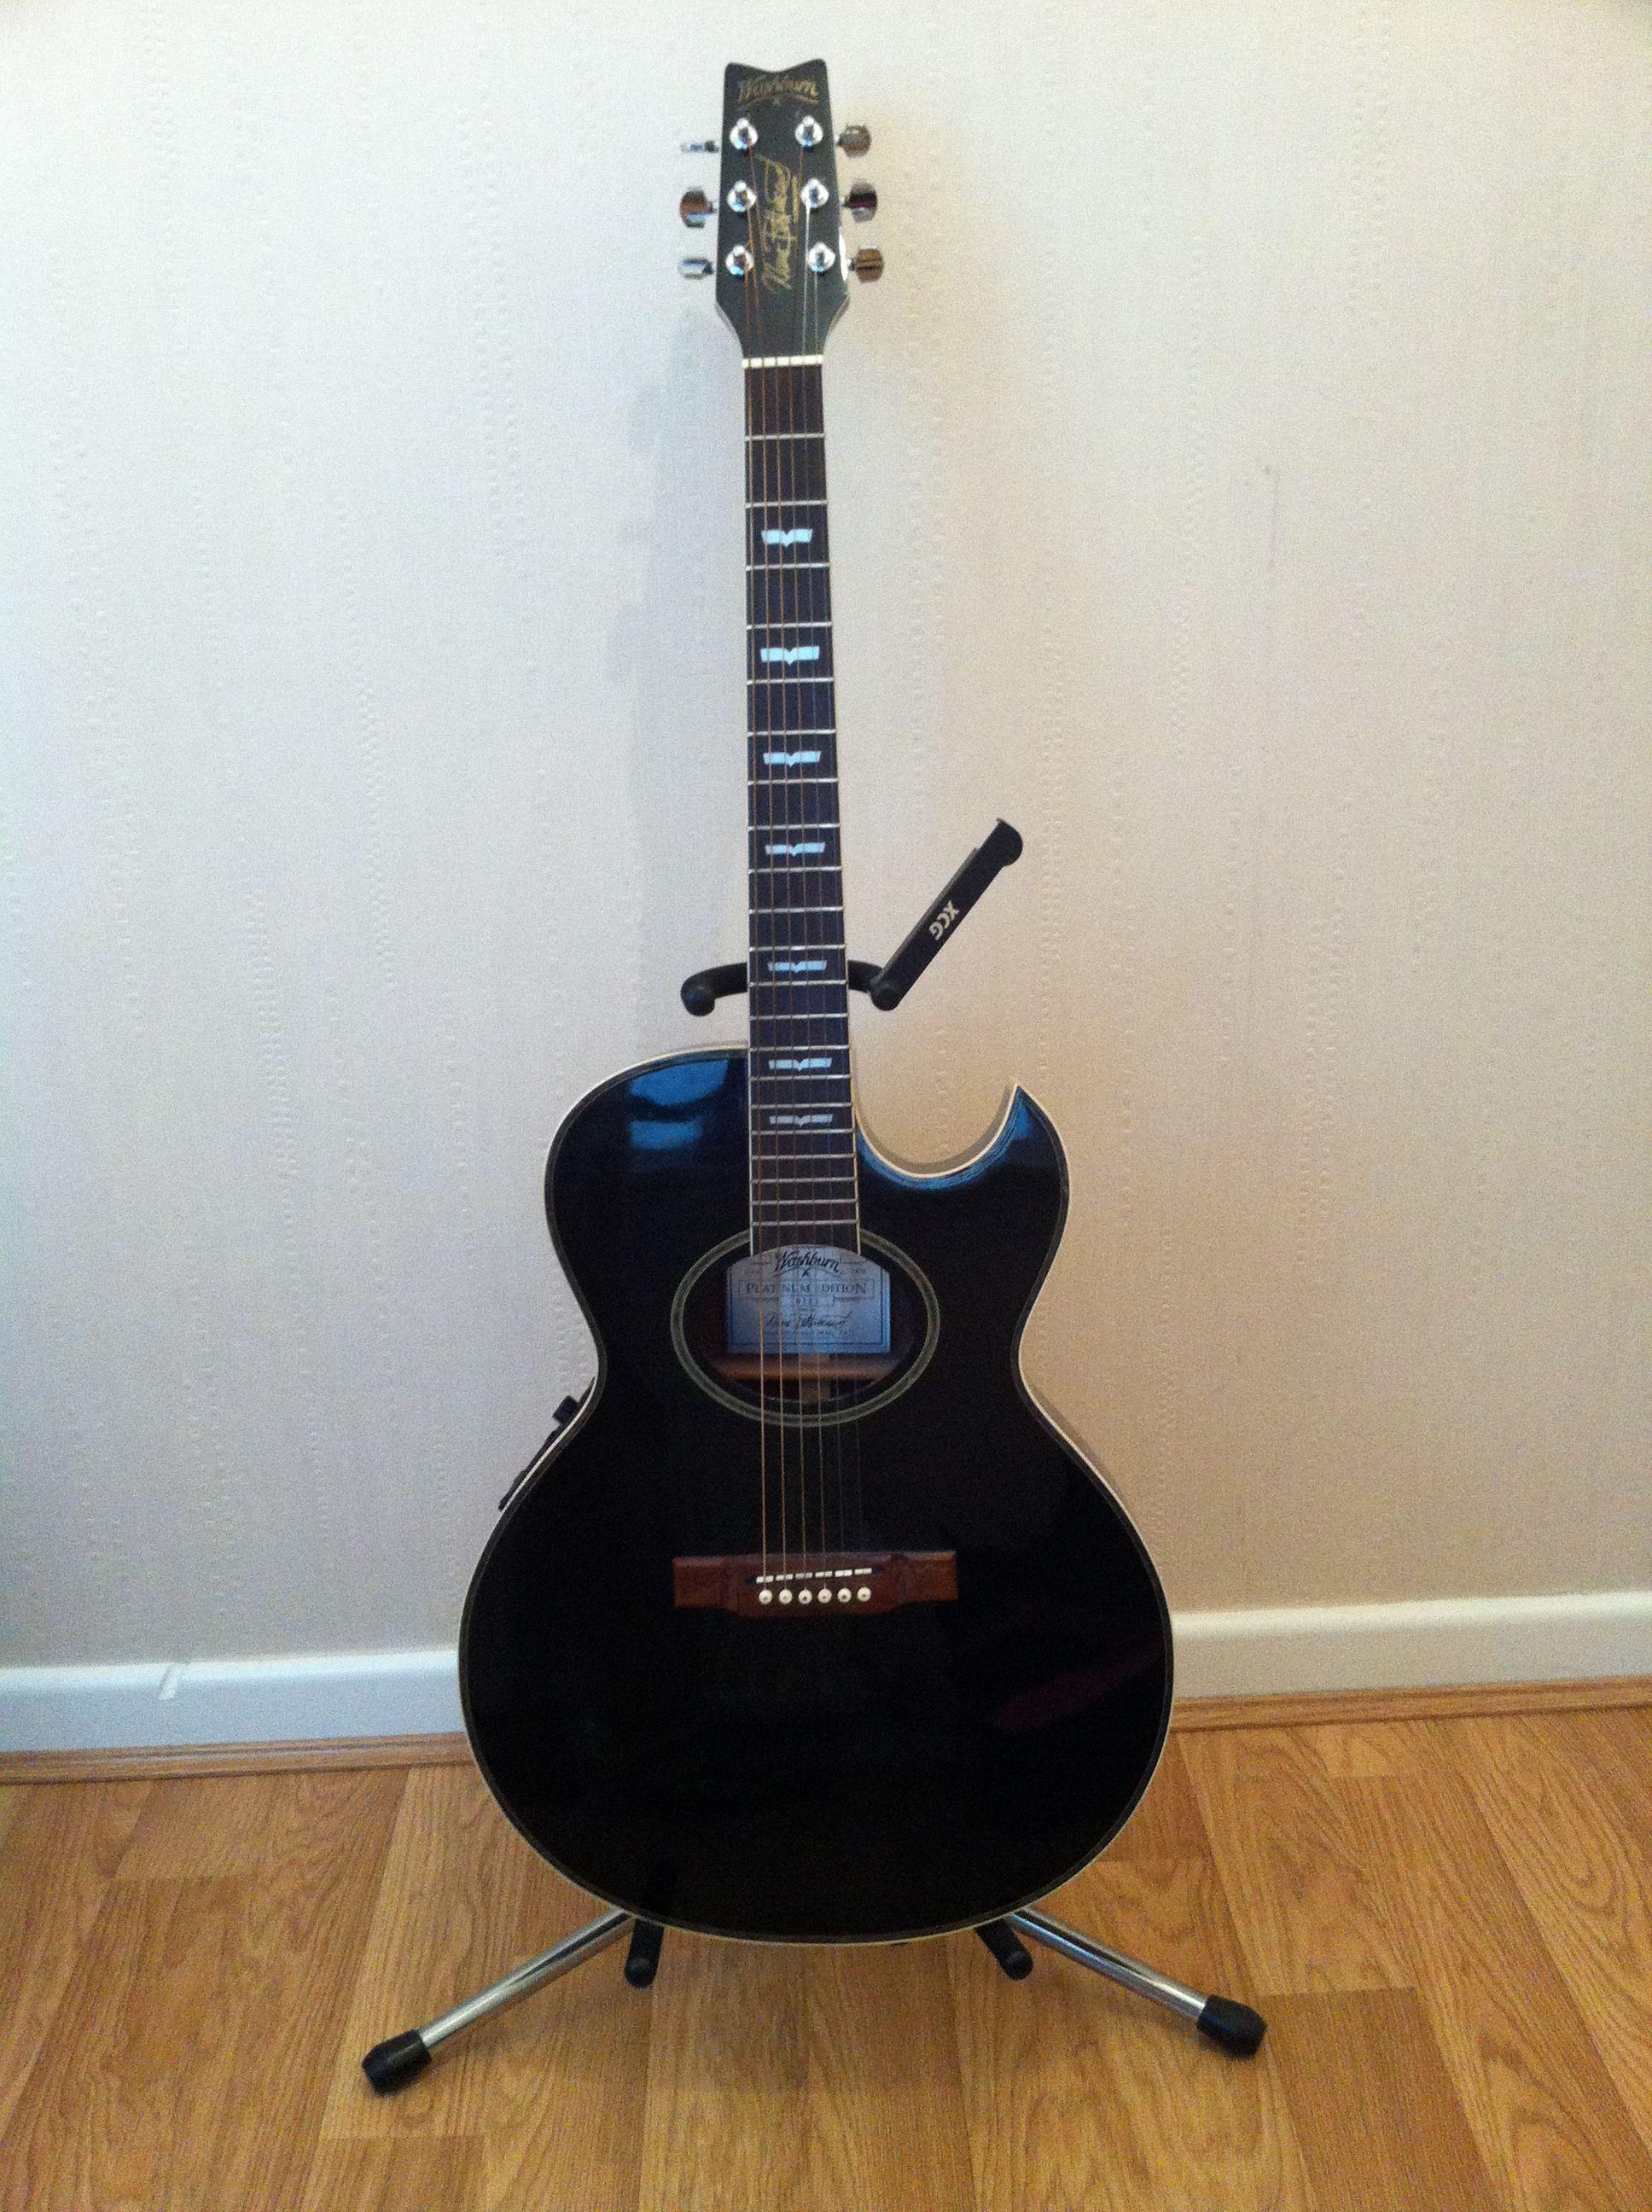 washburn ea22 semi acoustic nuno bettencourt signature guitars rh pinterest com Washburn N1 Nuno Bettencourt Nuno Bettencourt Model 2000